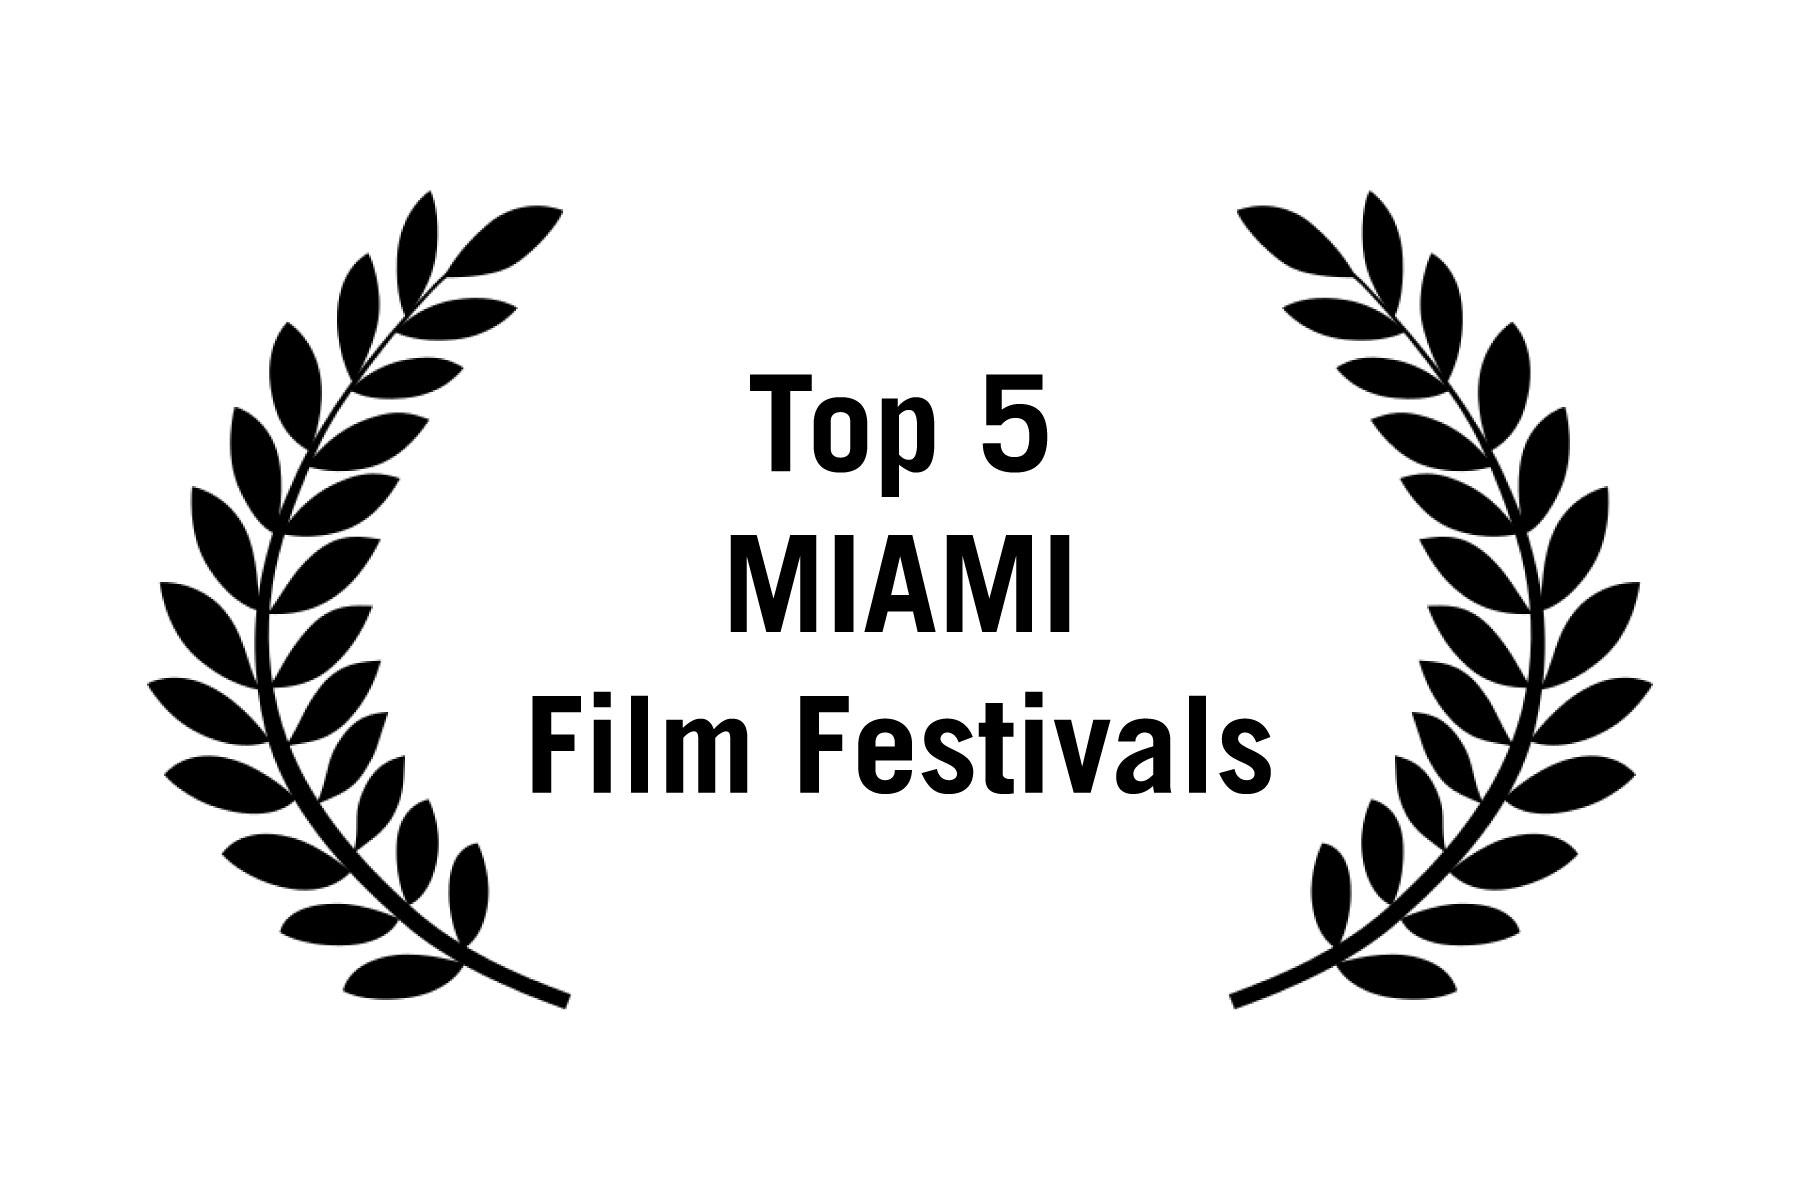 film festival wreath